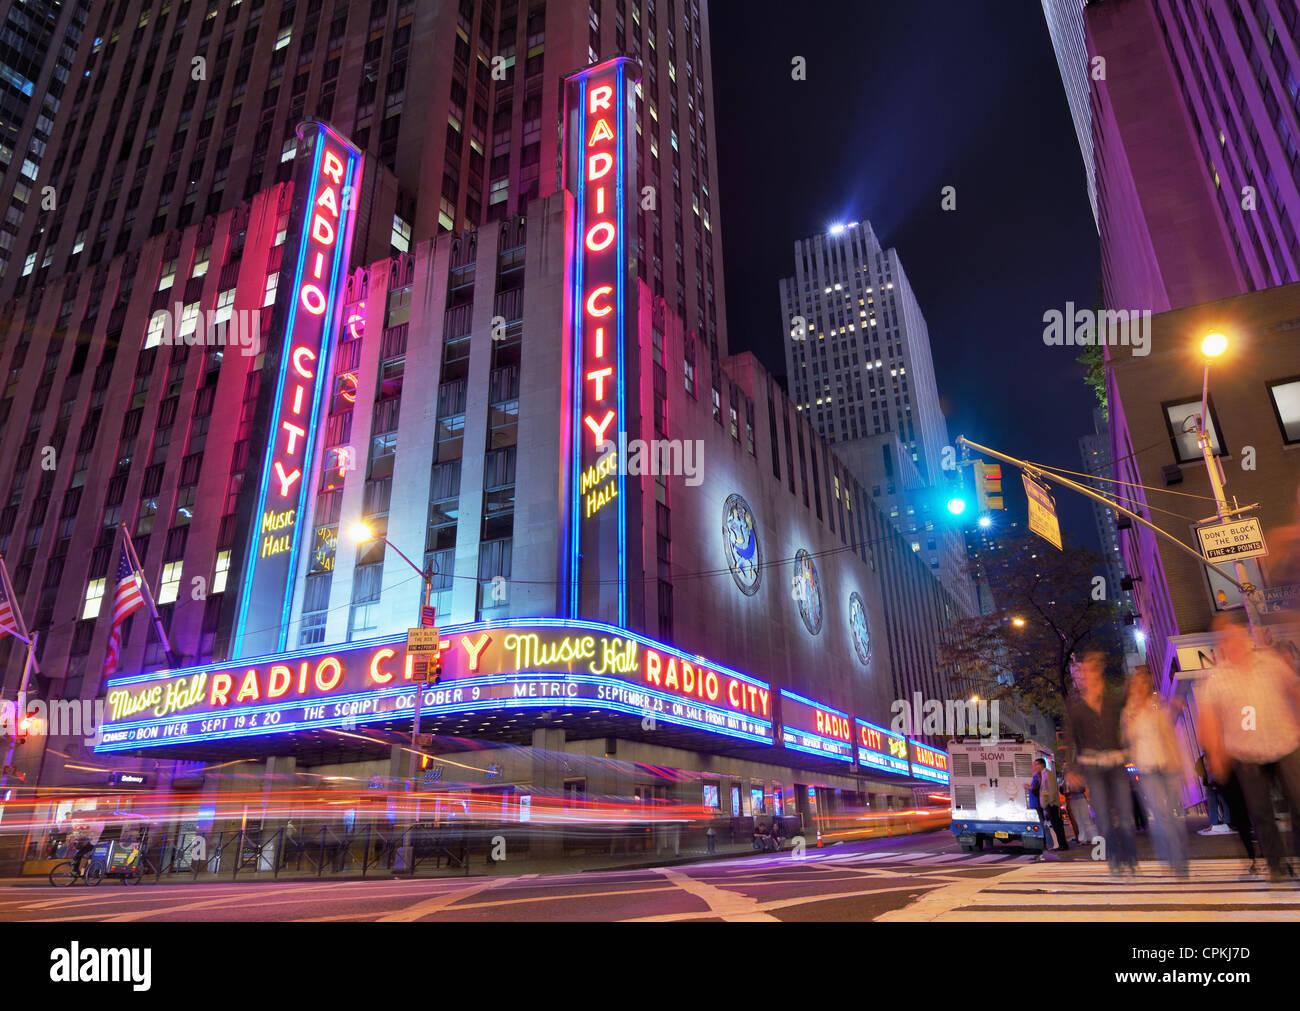 Radio City Music Hall in New York, New York, USA. - Stock Image